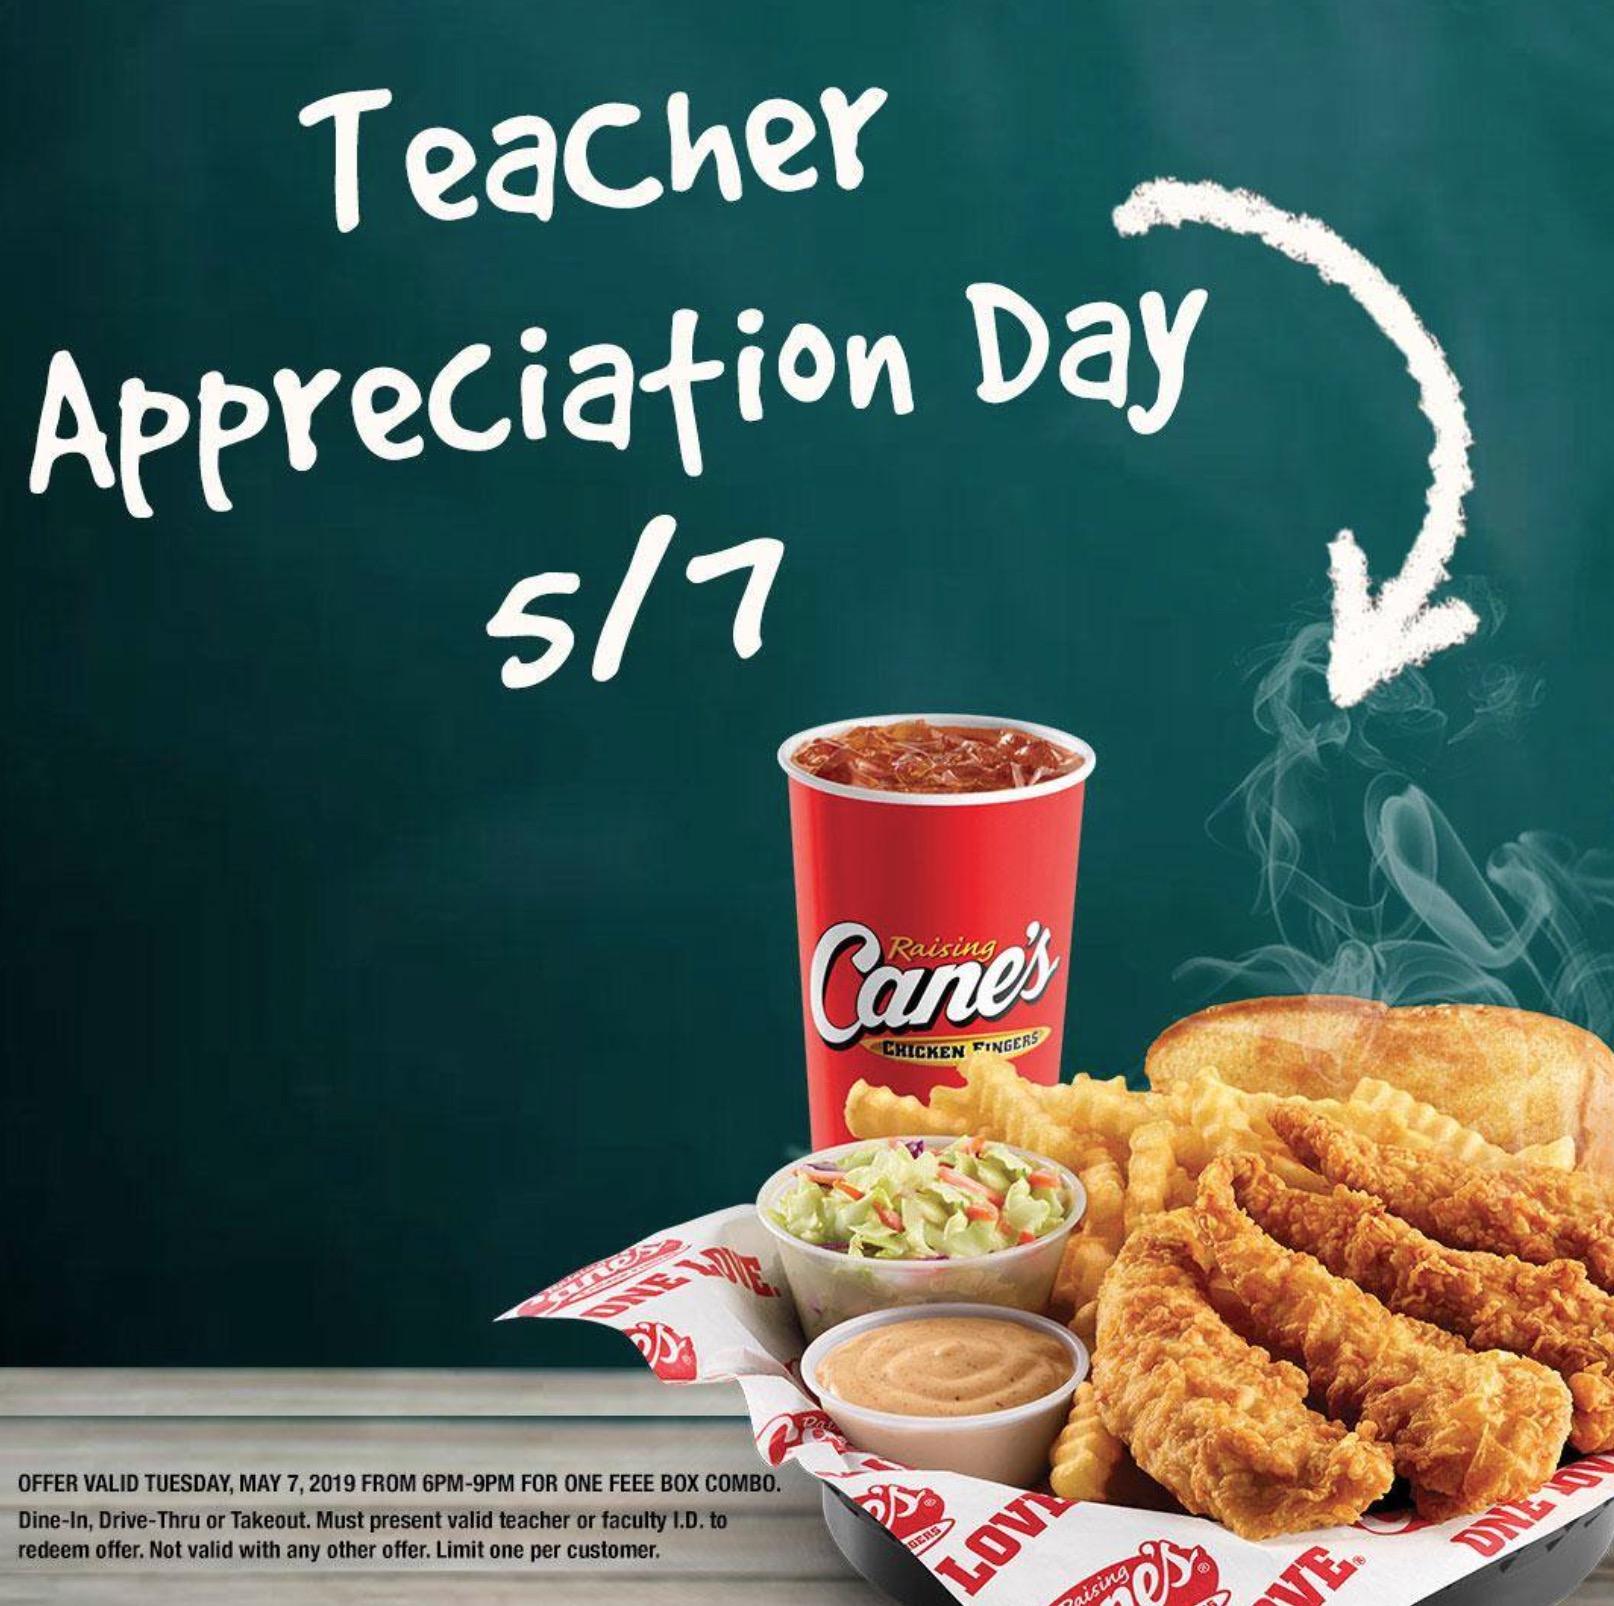 raising canes free box combo for teachers appreciation day